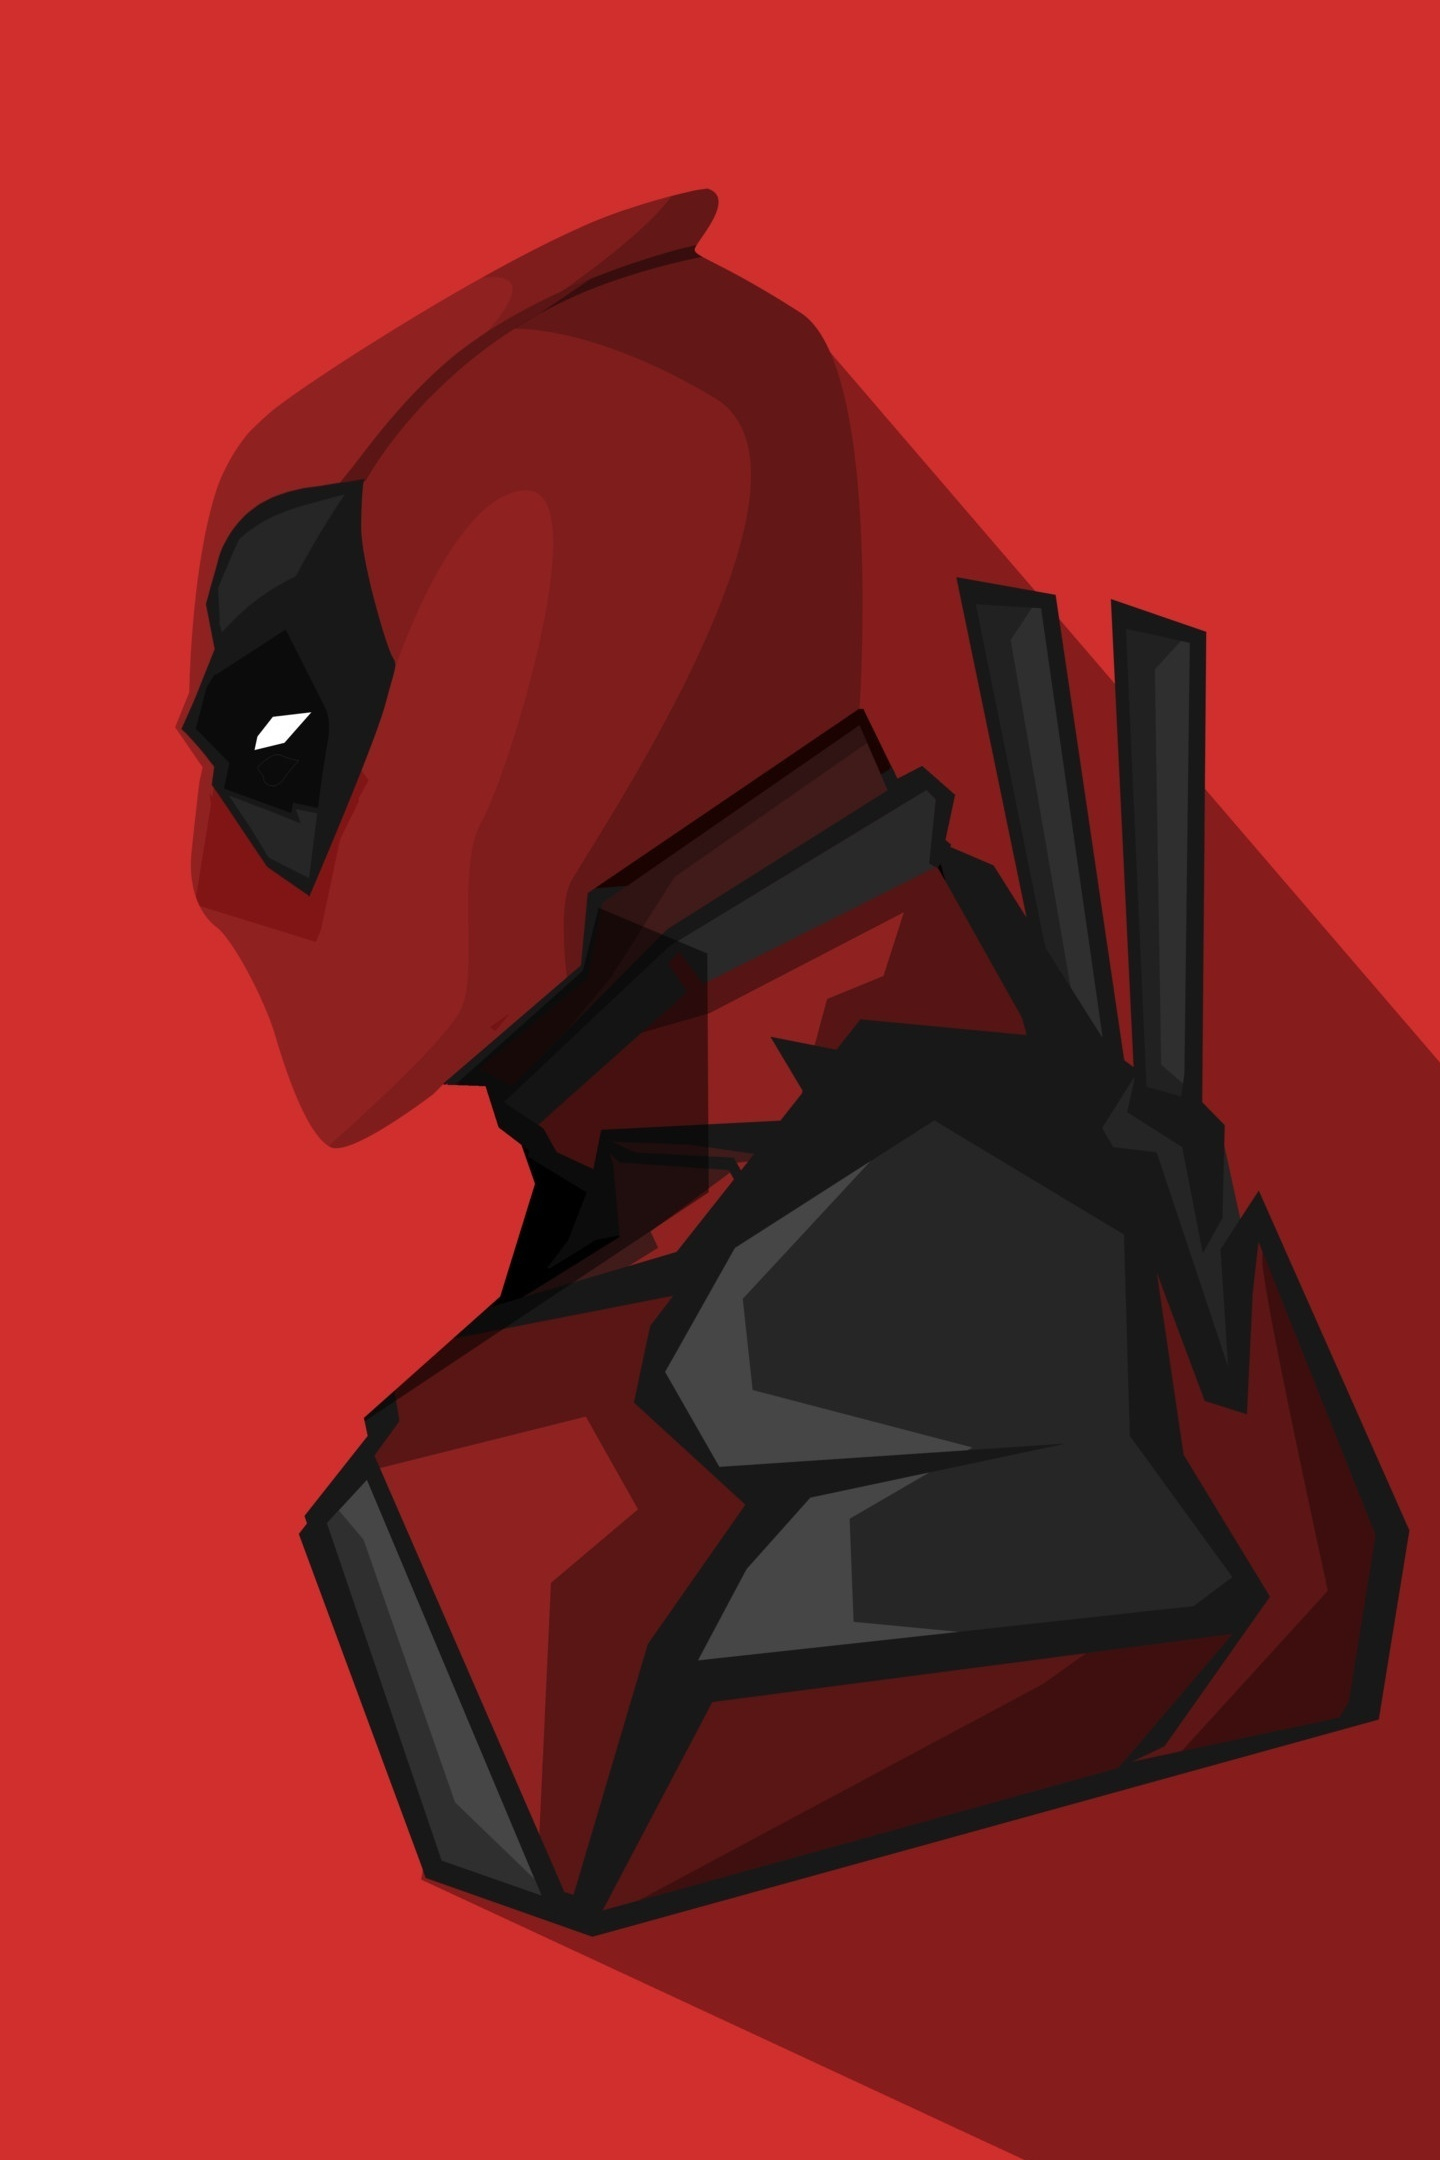 Deadpool Hd Wallpaper For Redmi Note 4  Download 1440x2880